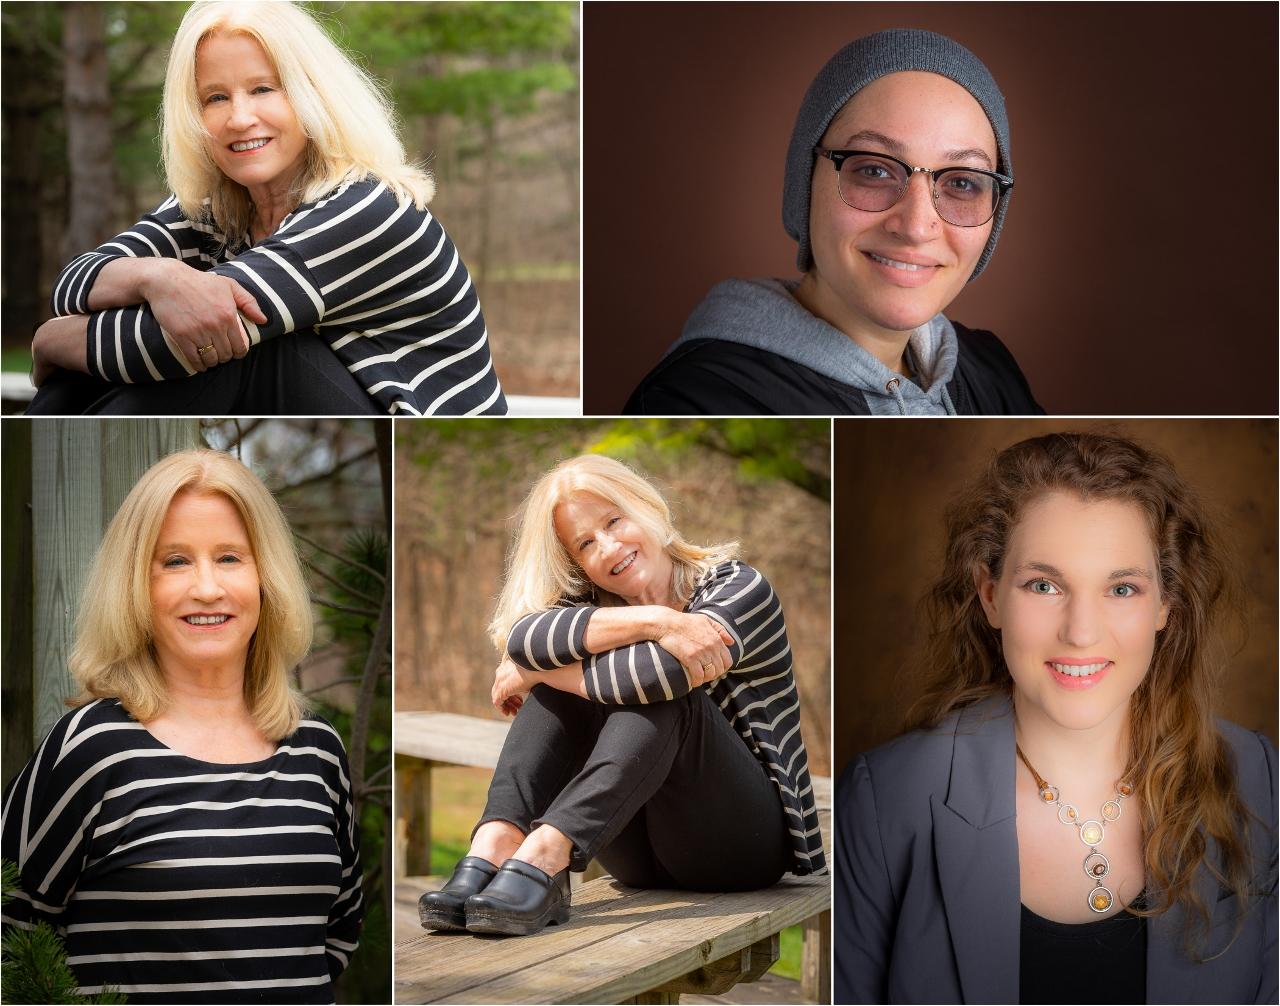 Ypsilanti and Ann Arbor MI portraits, head shots, senior, family photographer, real estate listing photographer